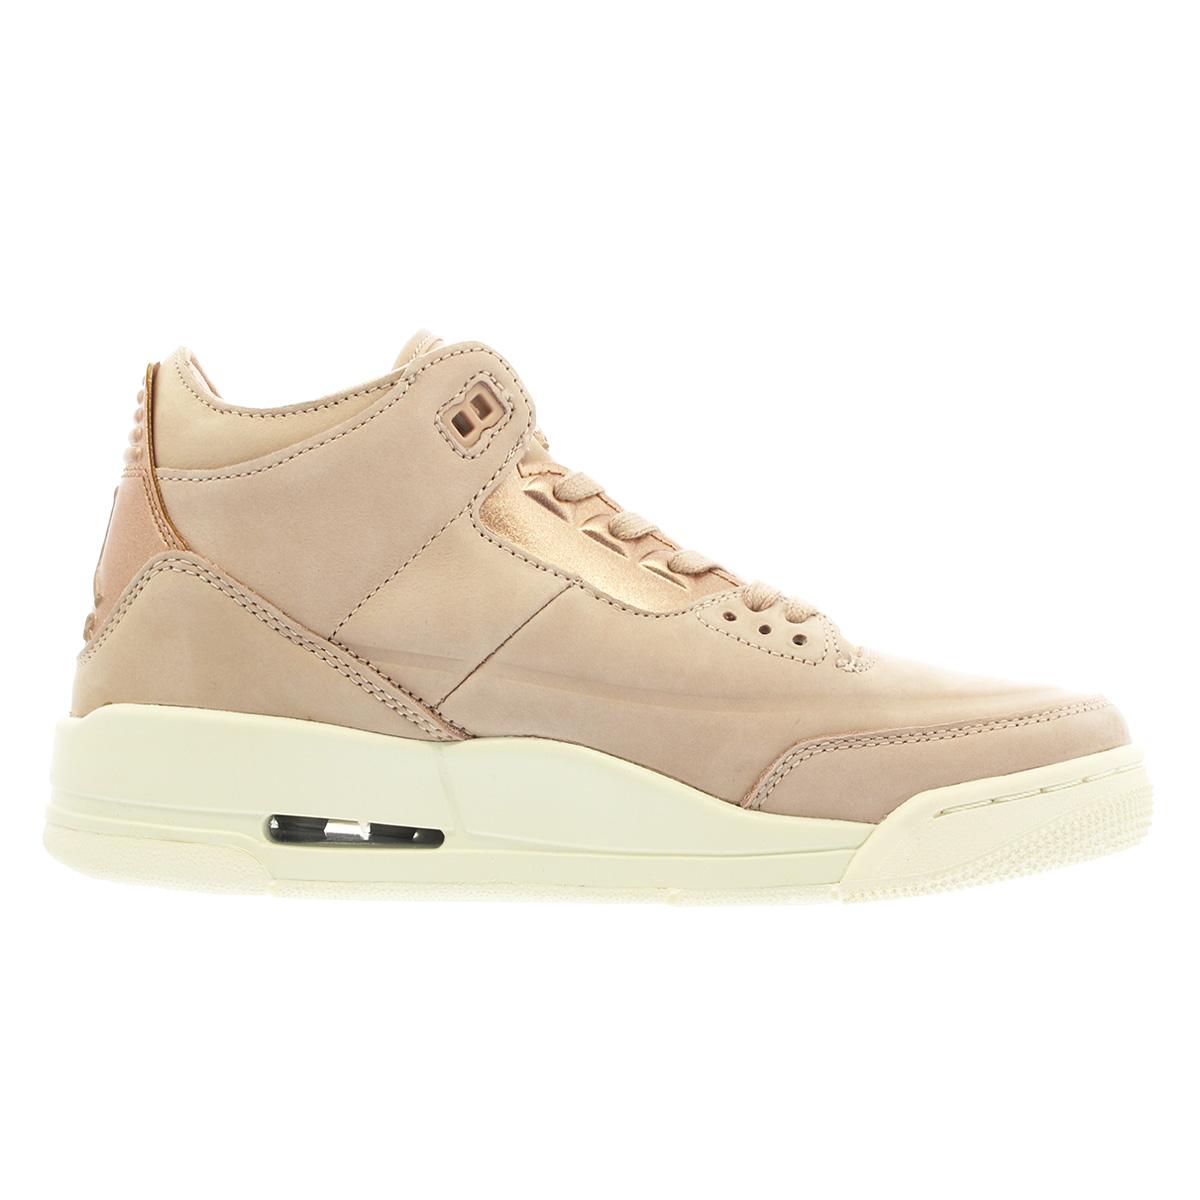 956feb557b79 NIKE WMNS AIR JORDAN 3 RETRO SE Nike women Air Jordan 3 nostalgic PARTICLE  BEIGE METALLIC RED BRONZE SAIL ah7859-205